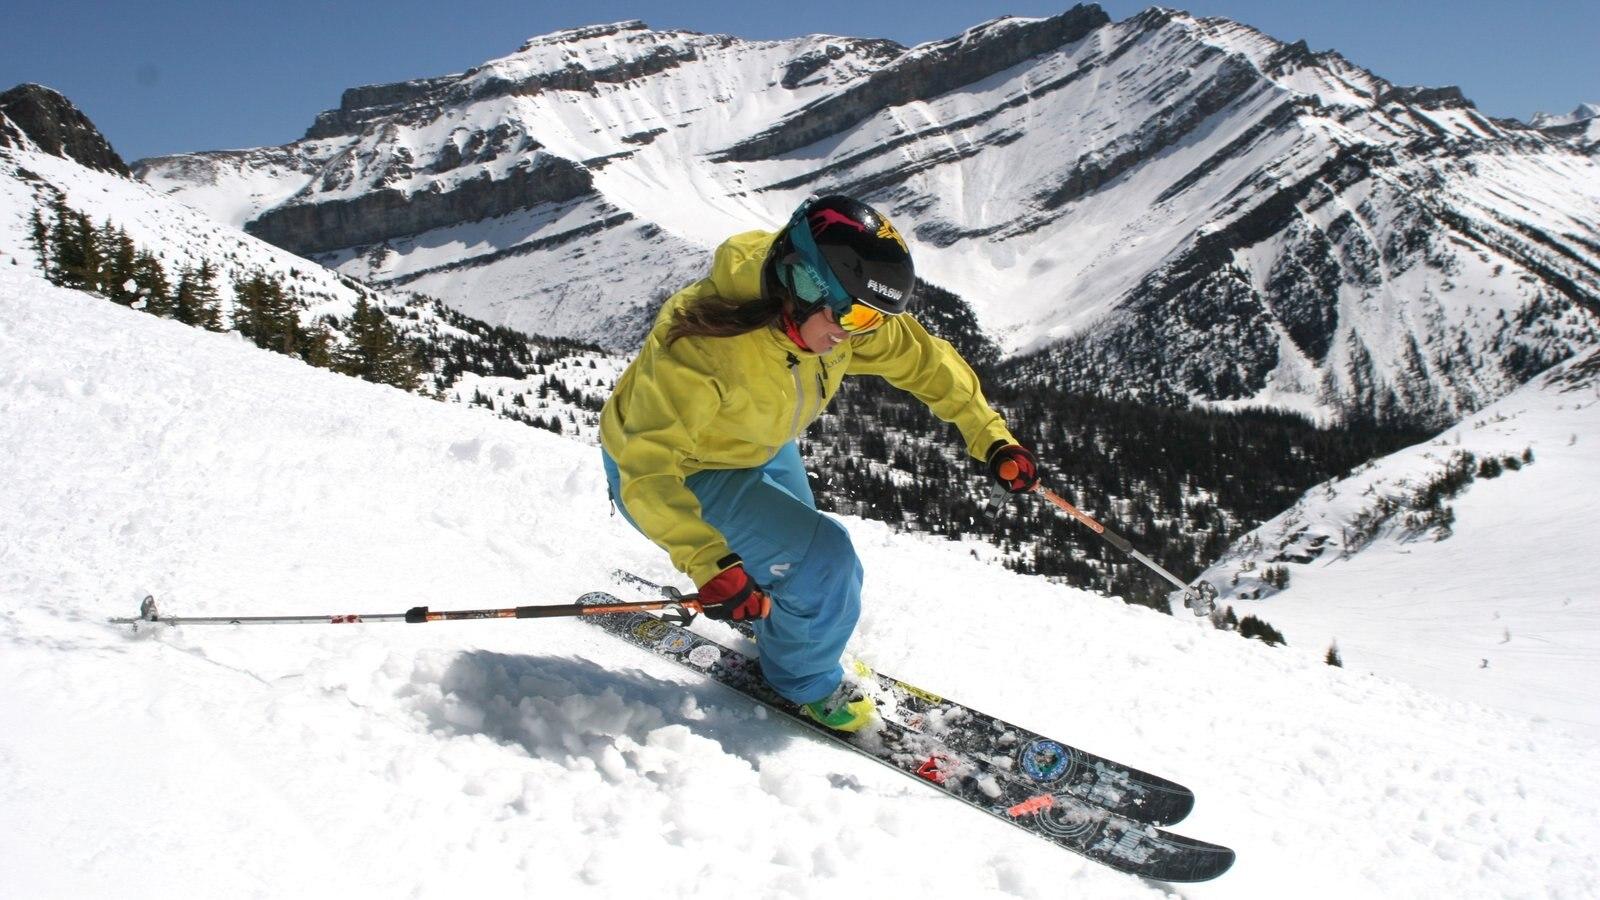 Lake Louise Mountain Resort showing mountains, snow skiing and snow